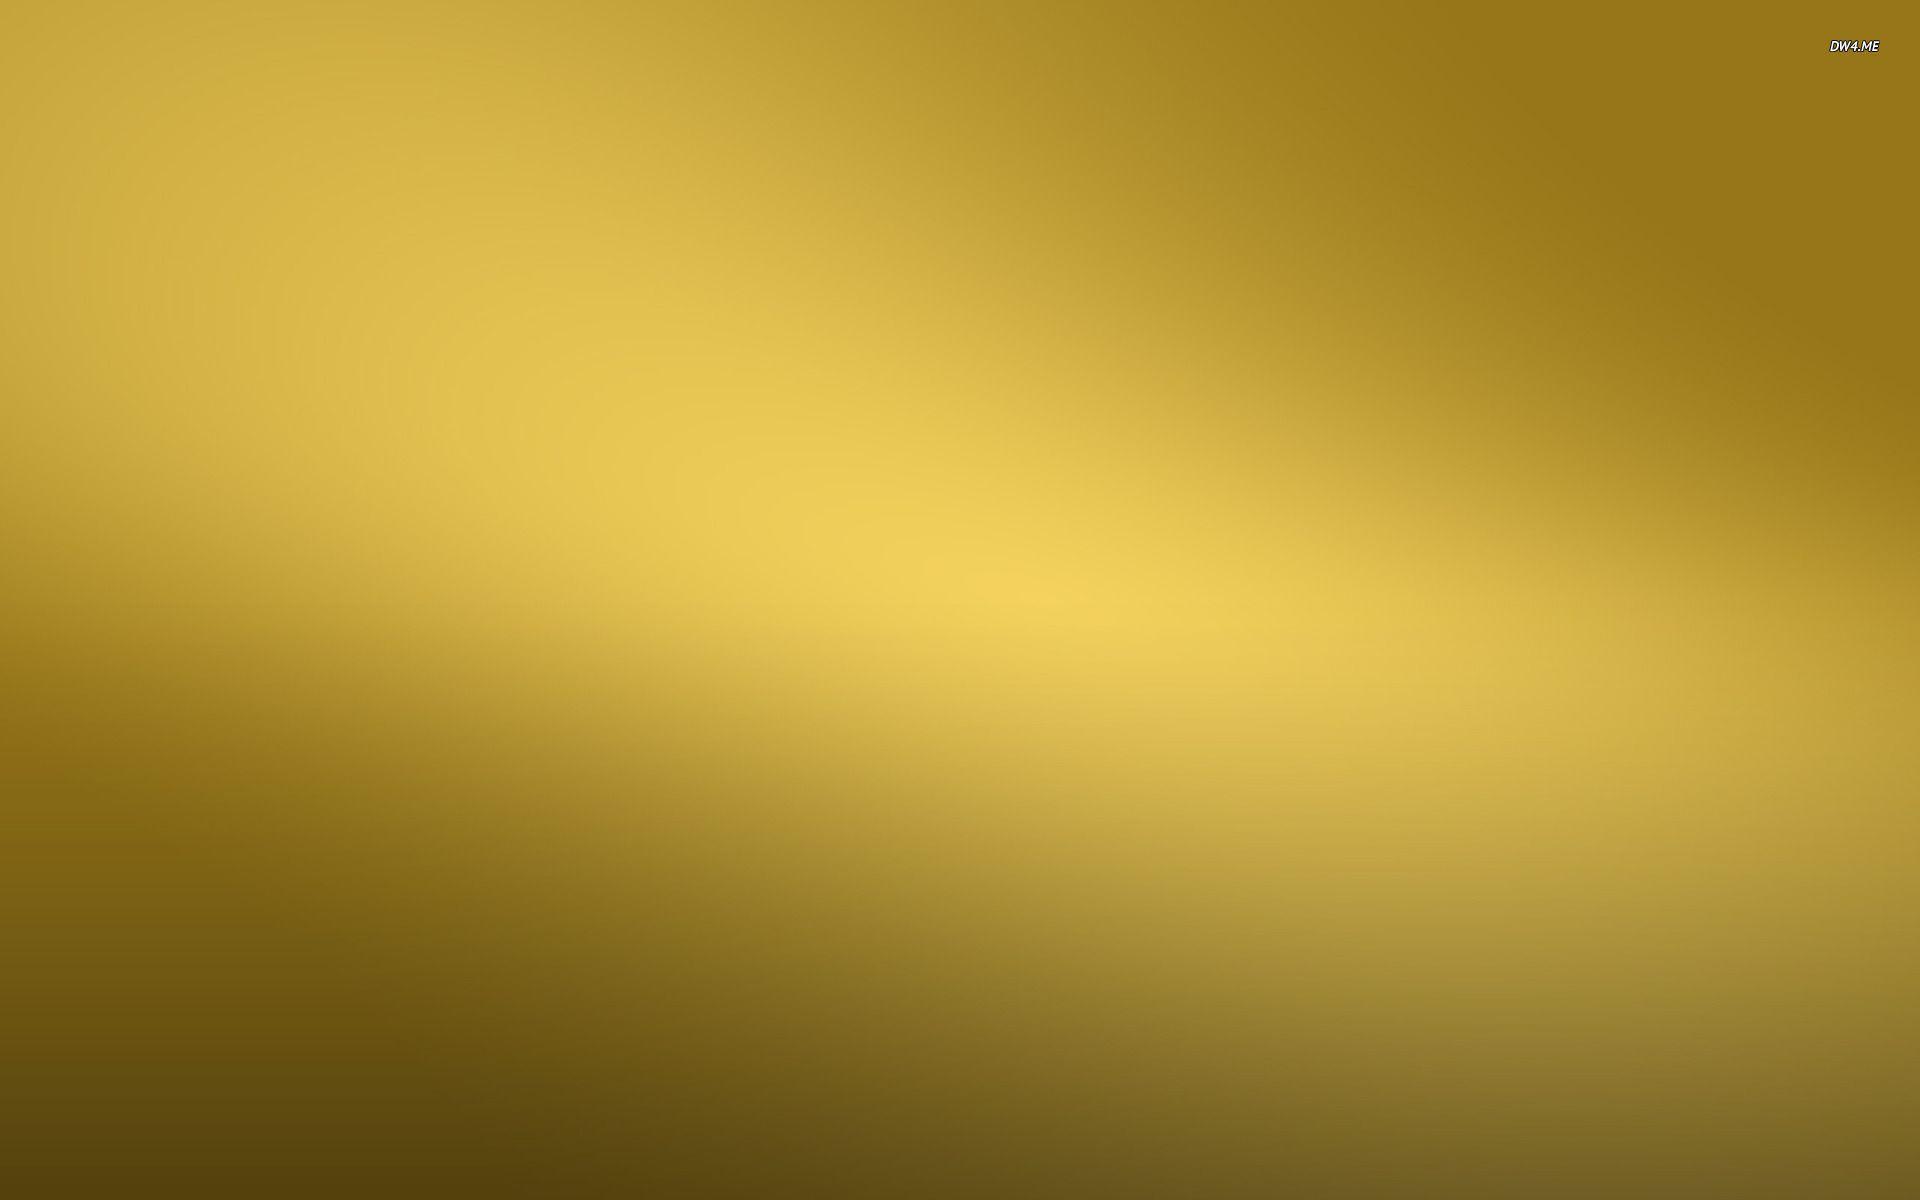 Gold-Wallpaper-64.jpg (1920×1200) | GRAPHIC DESIGN | Pinterest